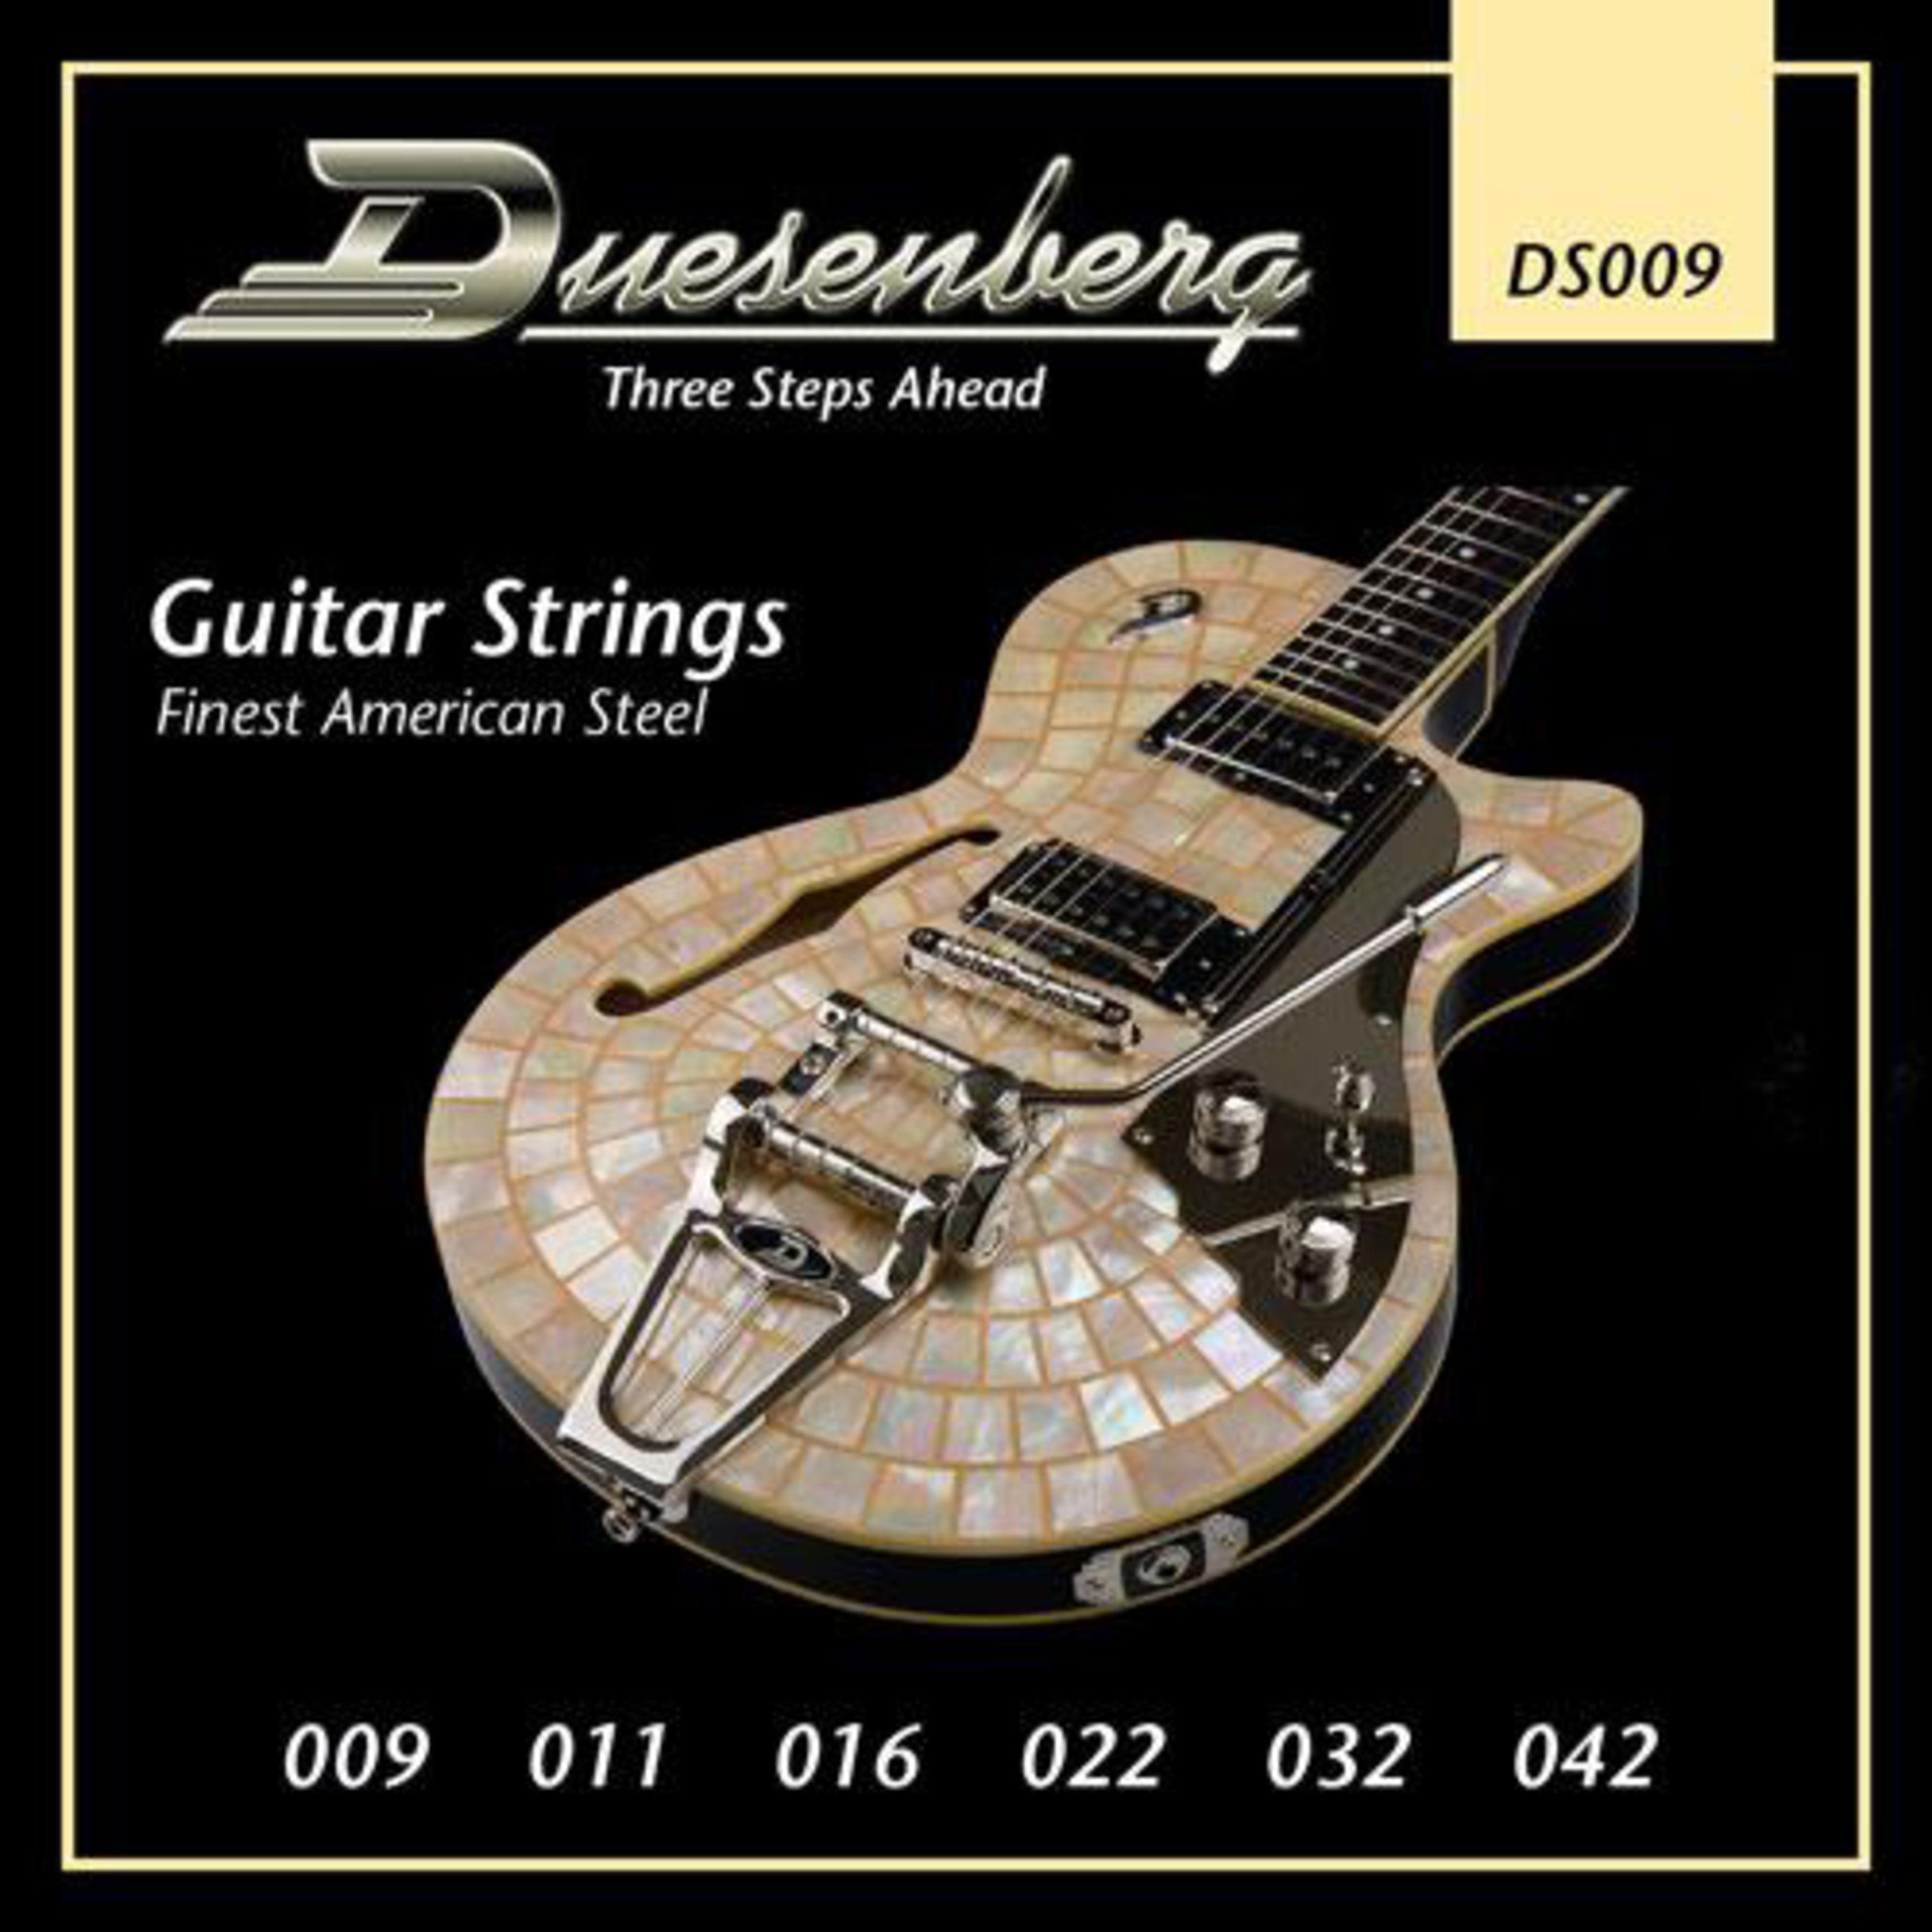 Duesenberg - DS009 09-42 E-Gitarren Saiten Nickel Wound